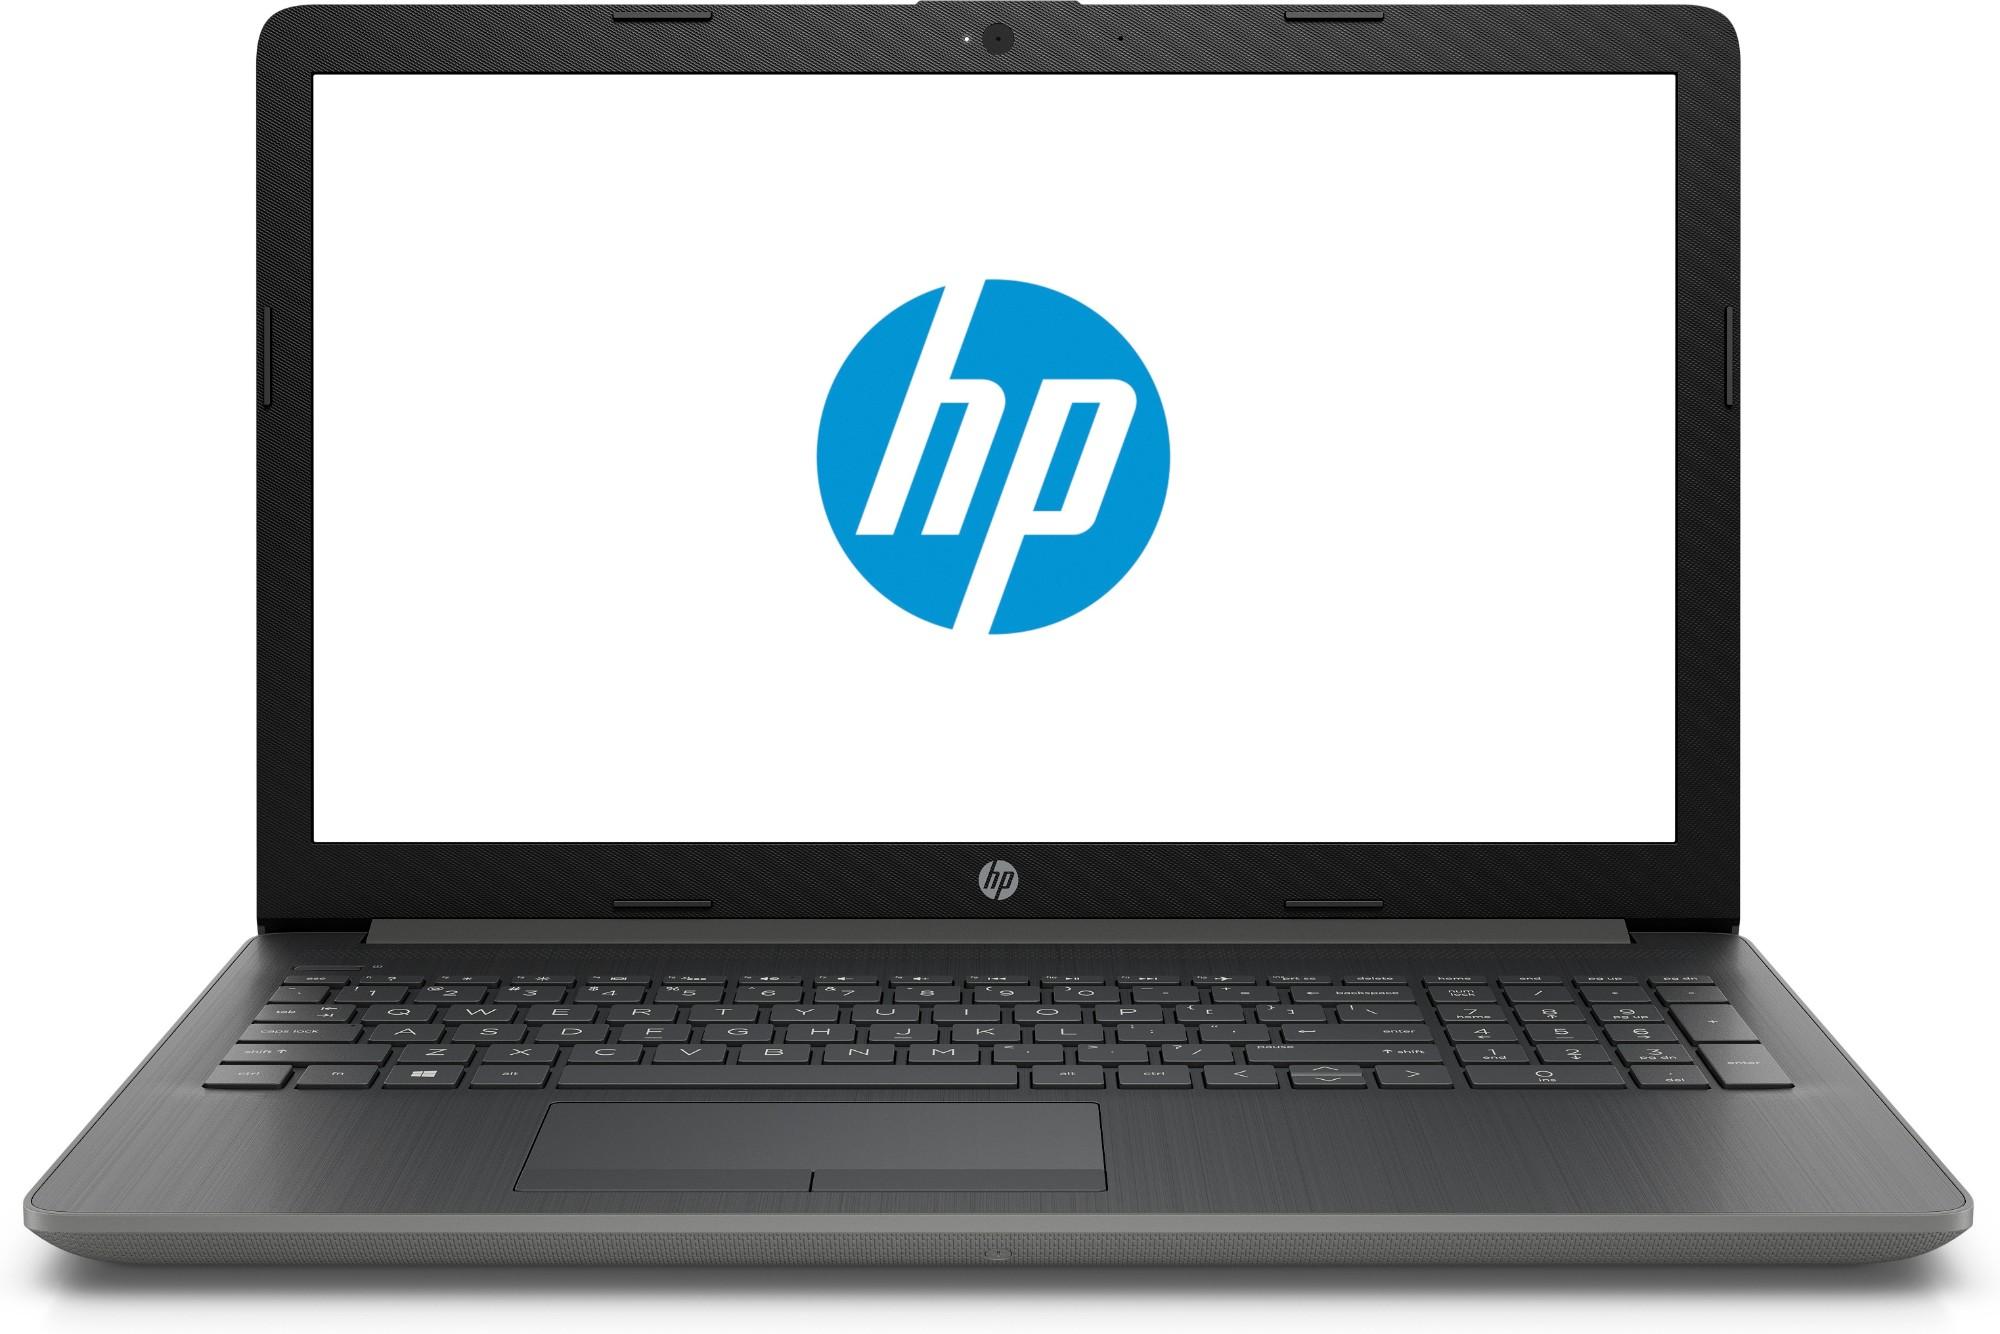 61eb2761588 HPshop.ie HP 15-db0002na Grey,Silver Notebook 39.6 cm (15.6